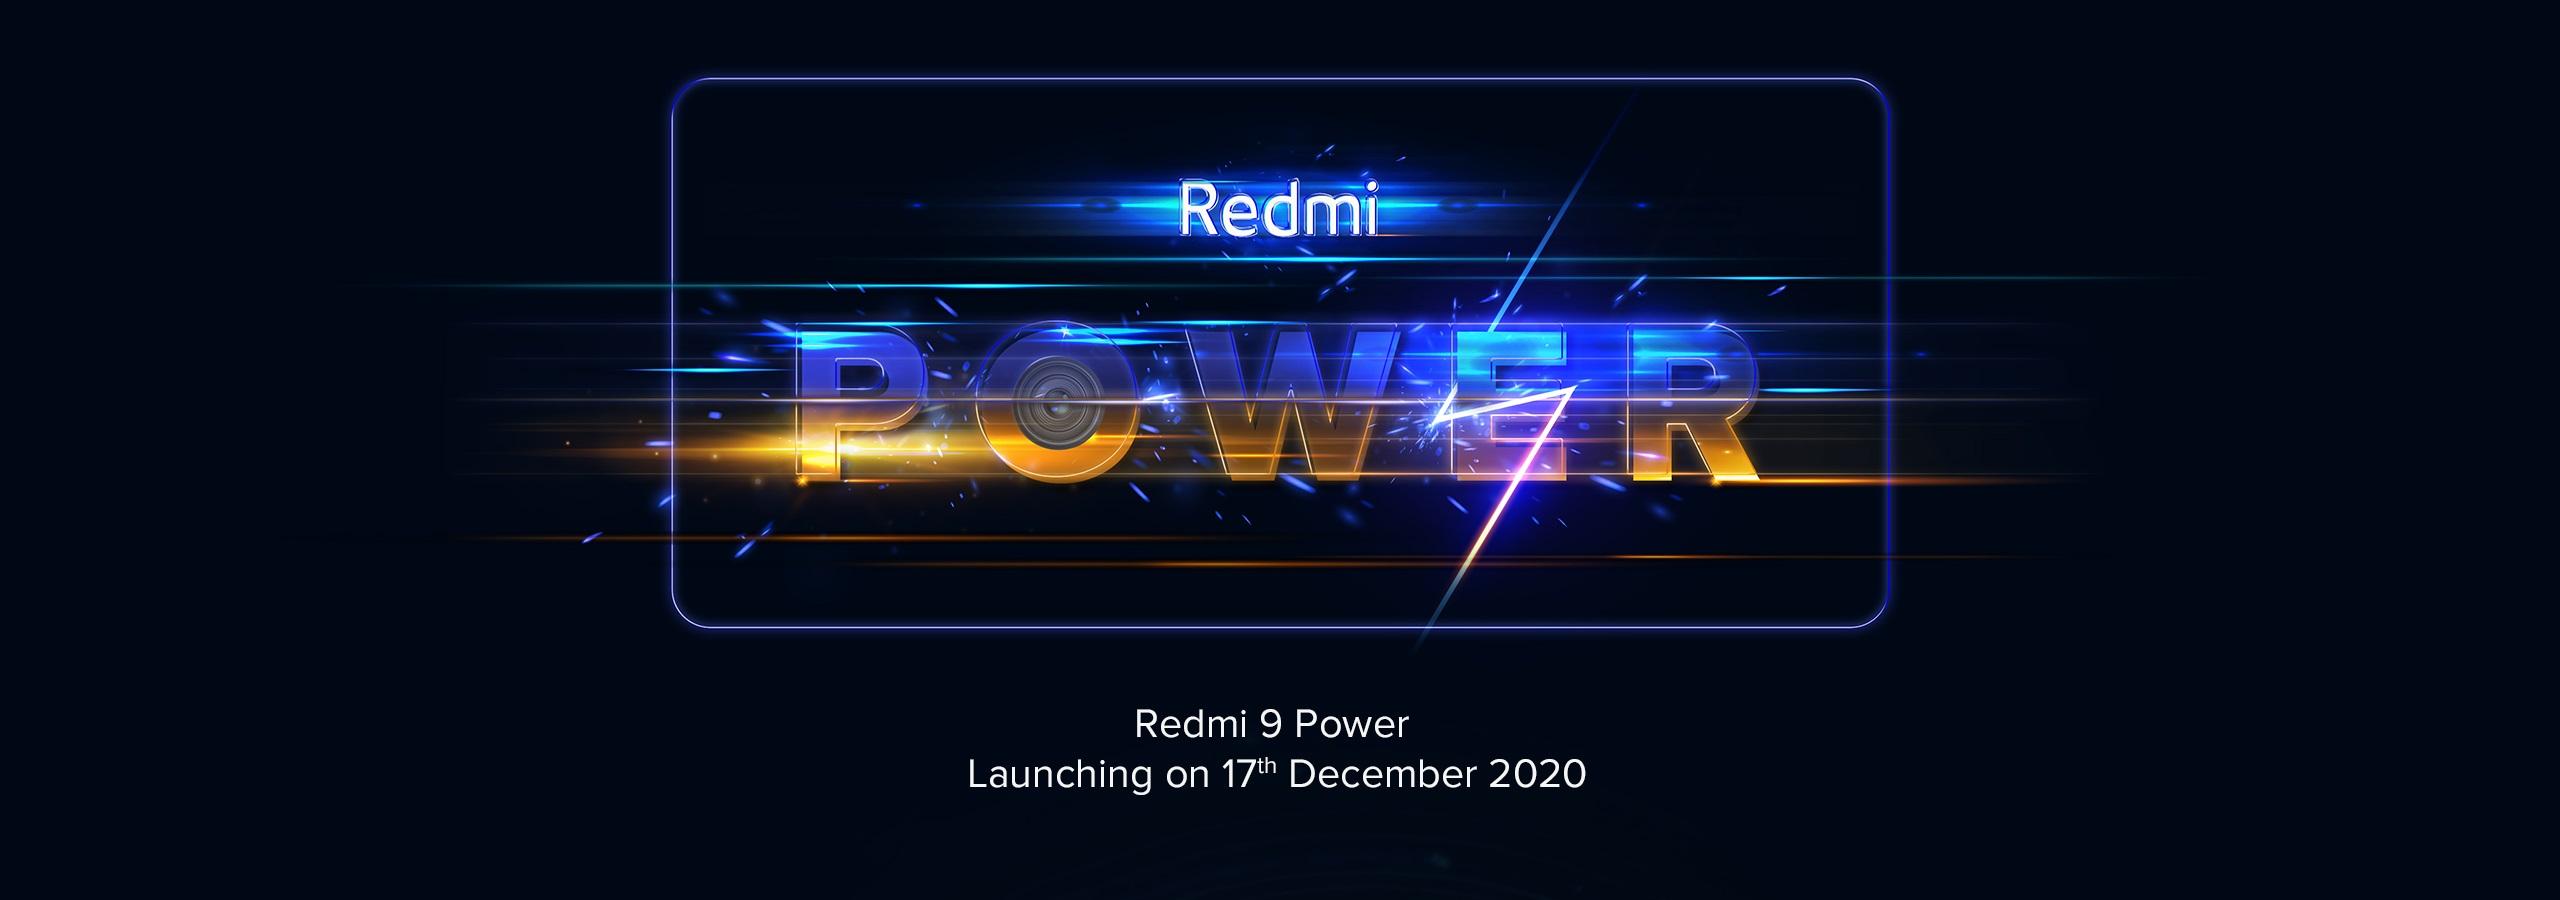 smartfon Redmi 9 Power smartphone teaser